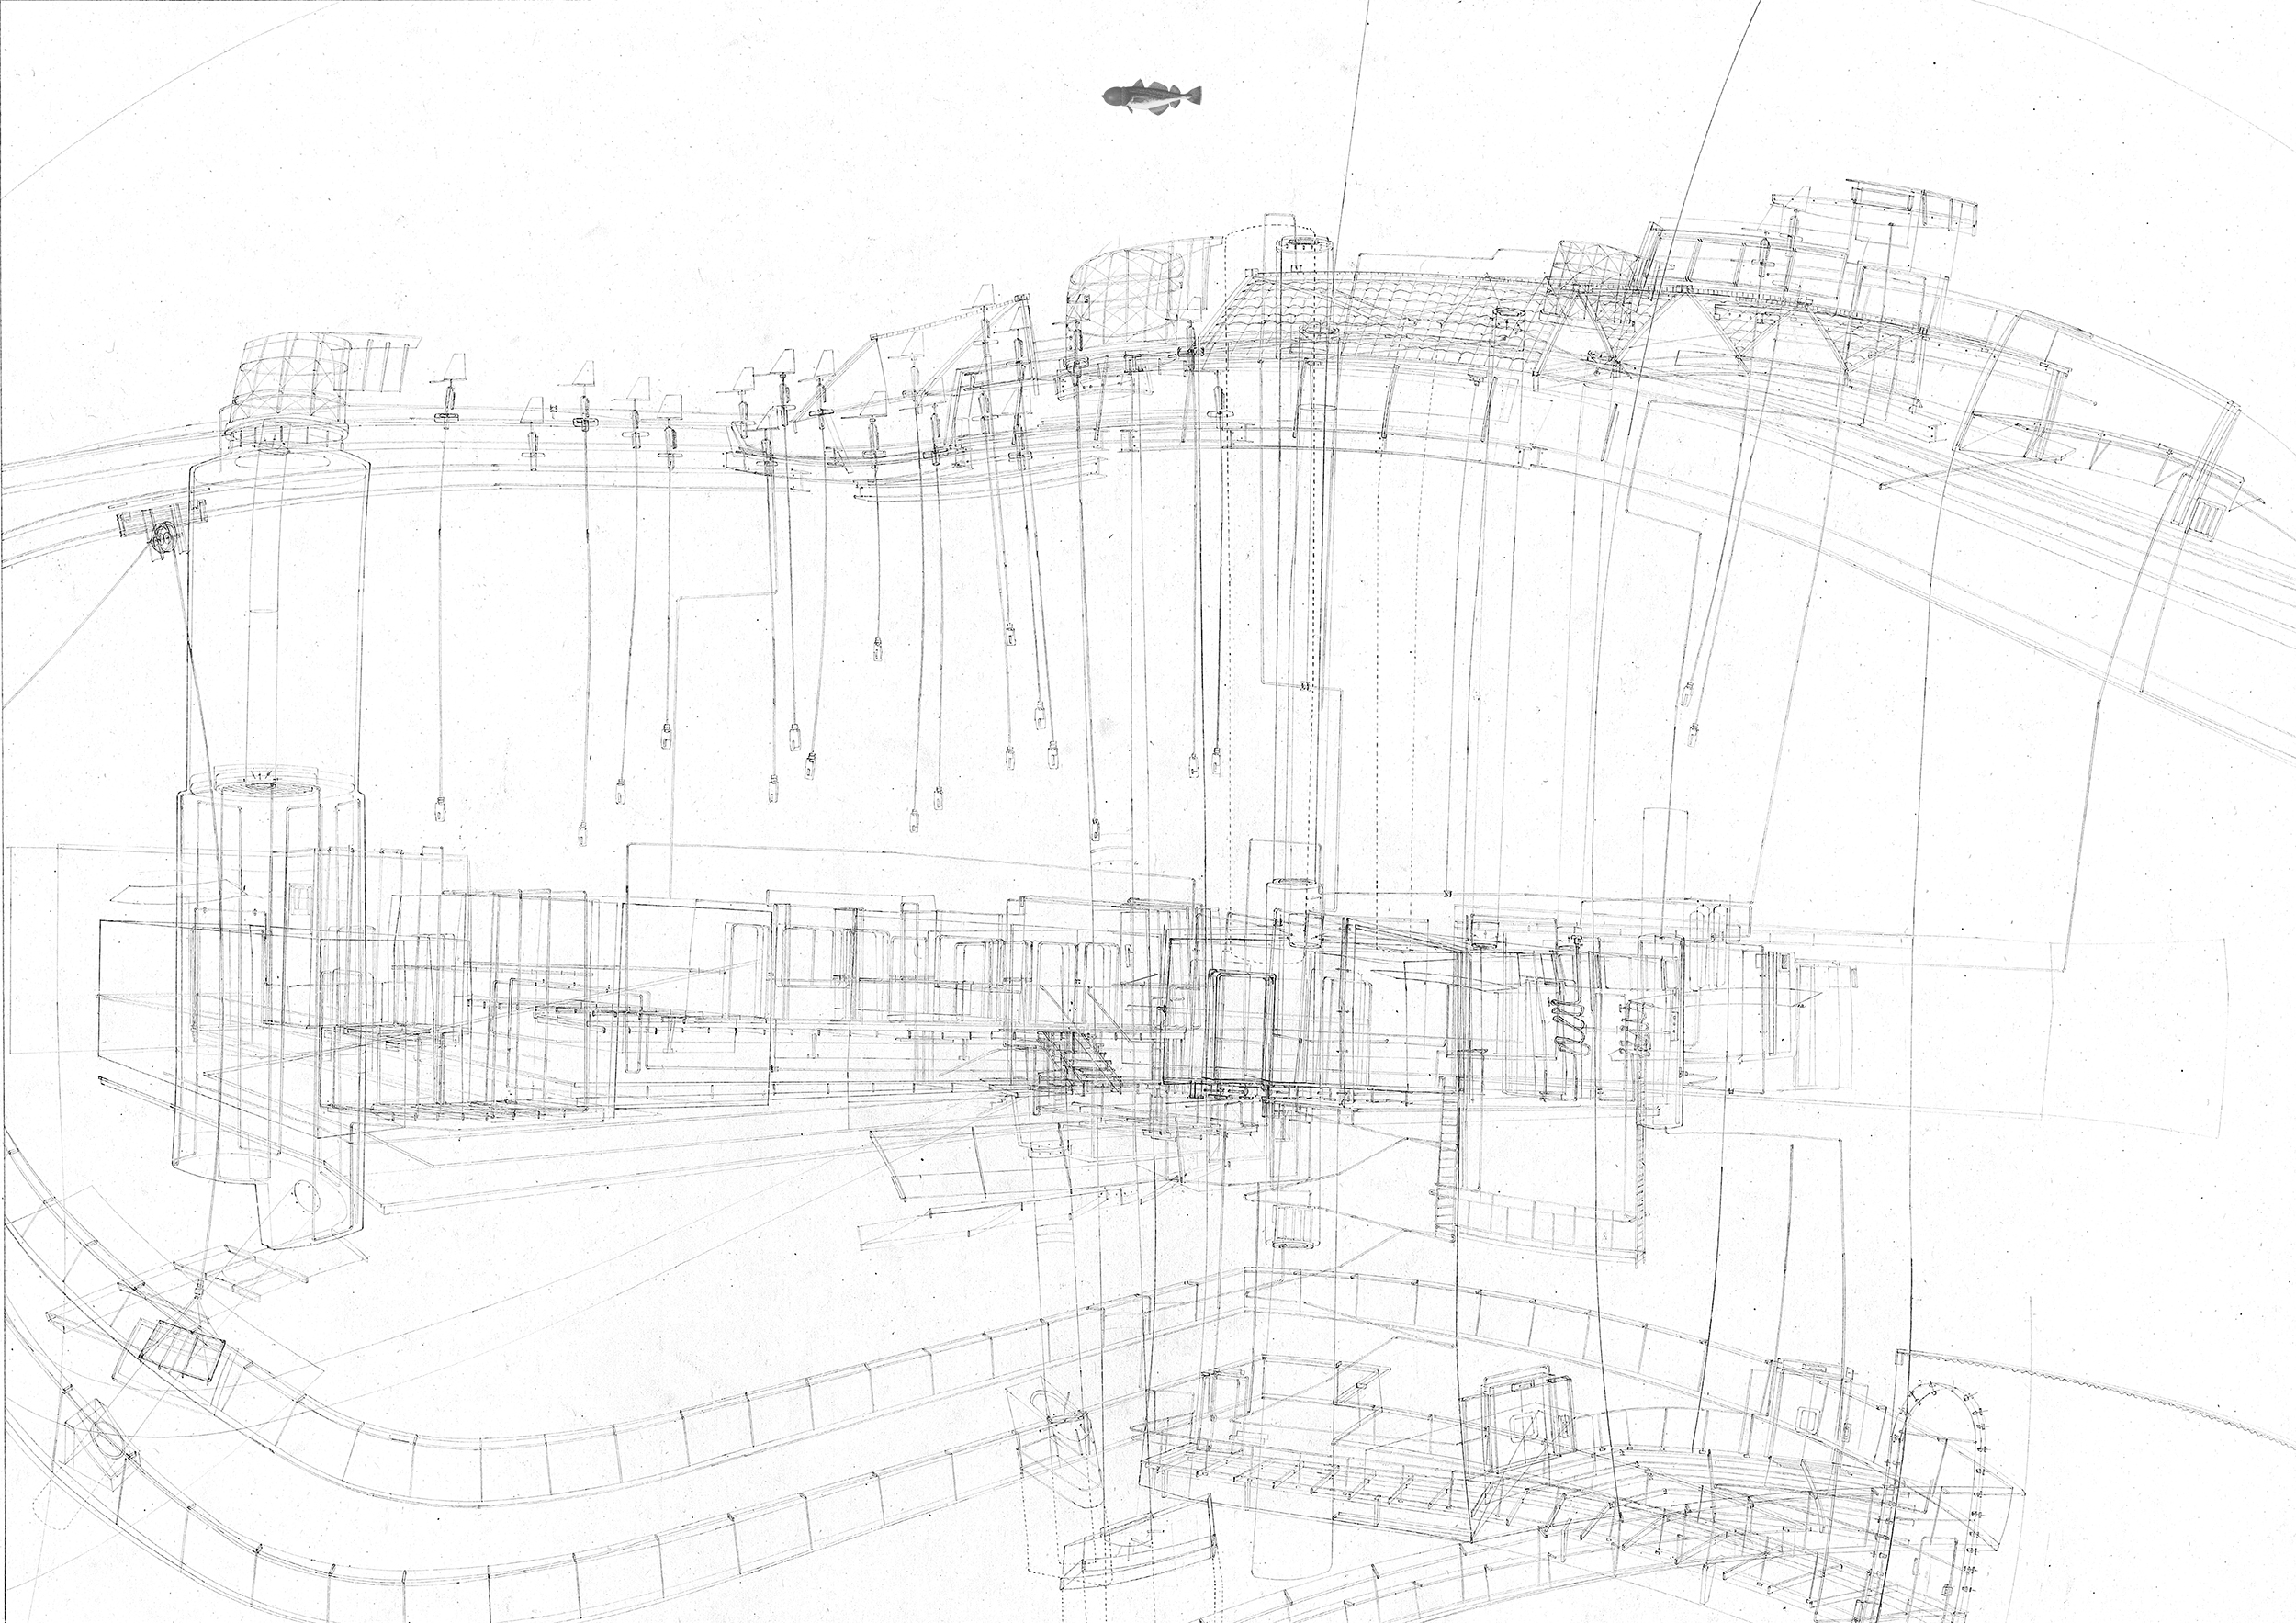 Alephographic01.jpg